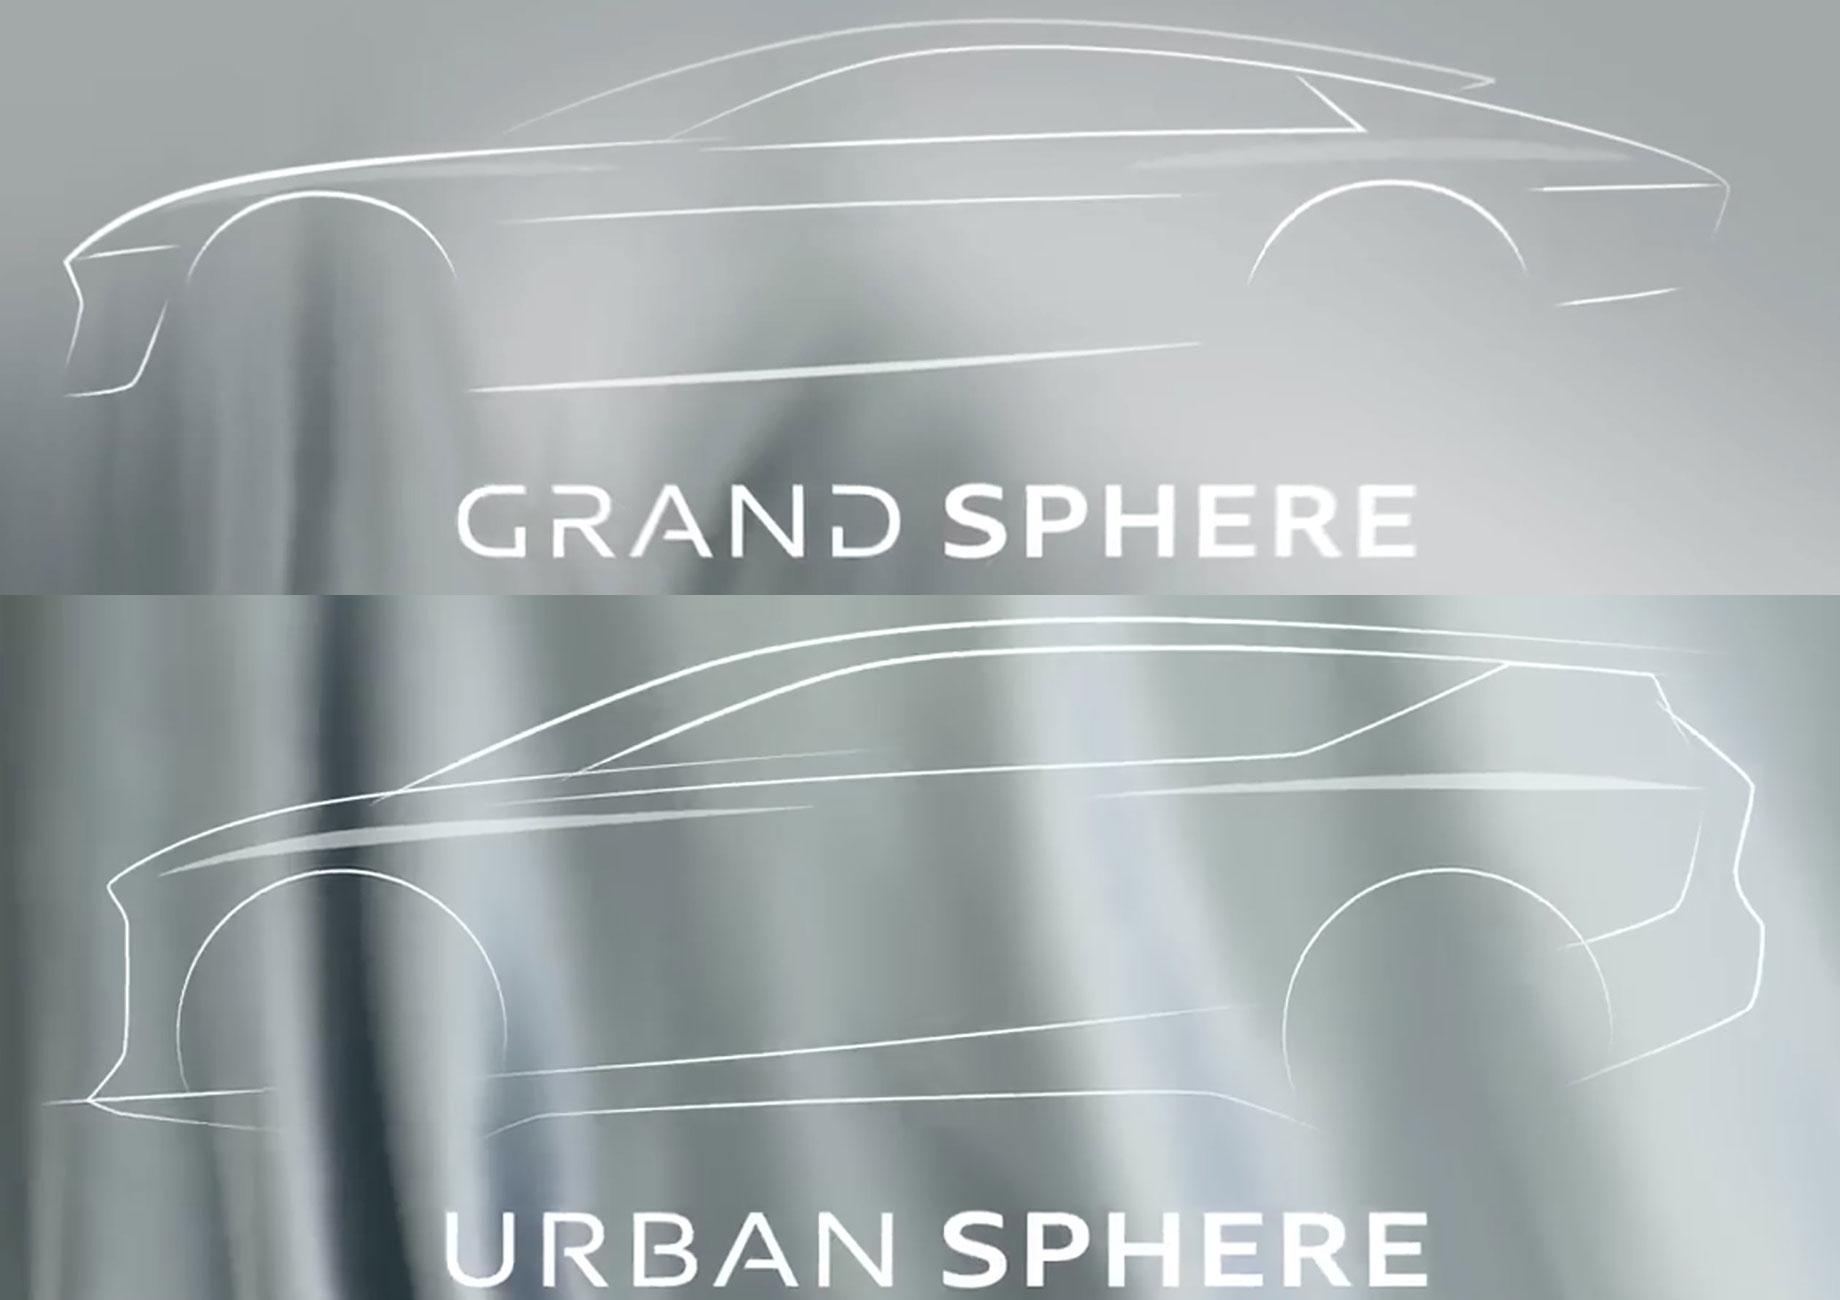 Audi анонсировала серию электрических концептов Sphere